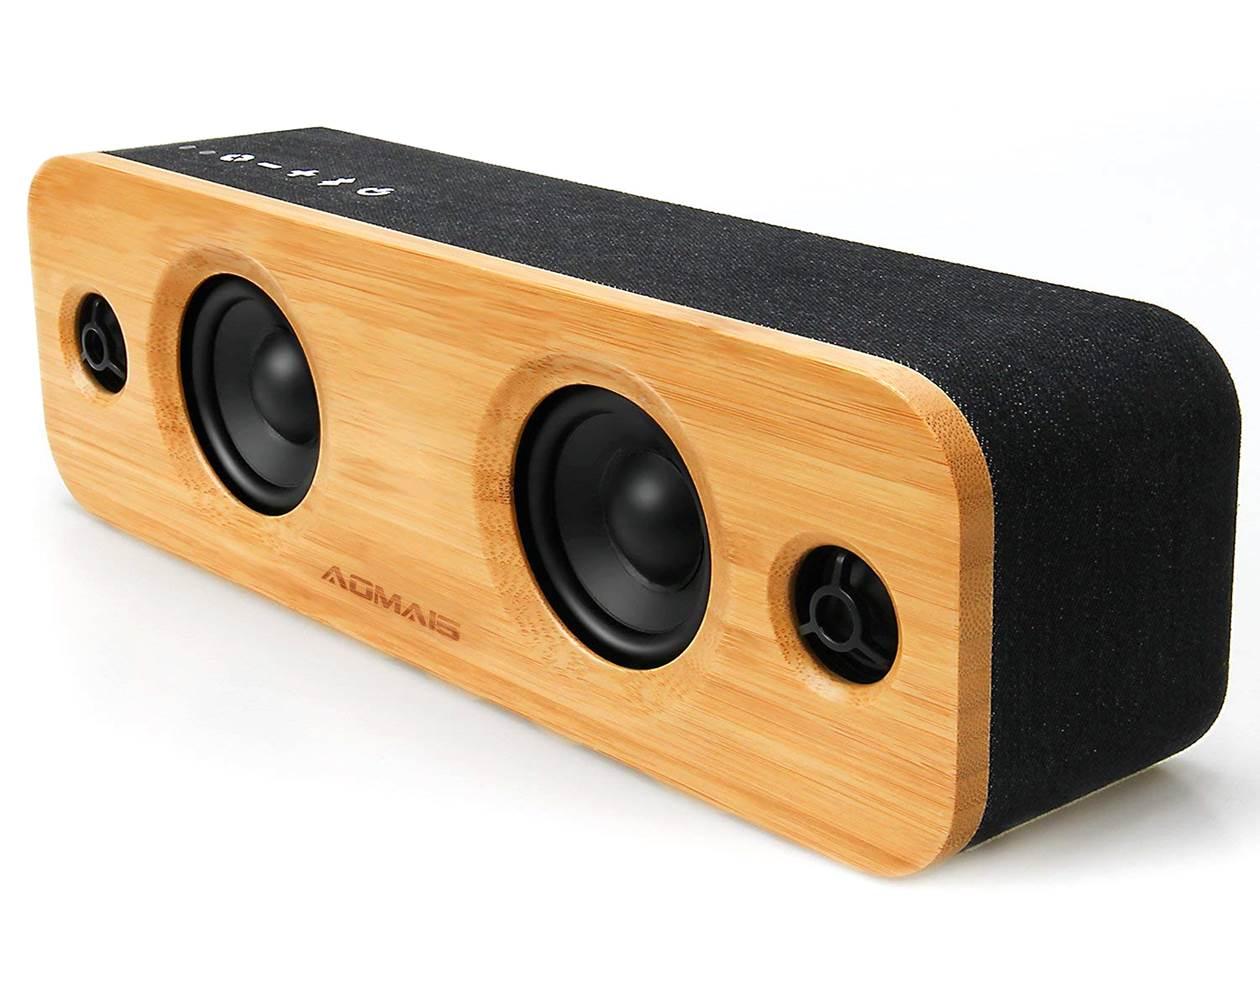 AOMIAS Life 30W Bluetooth Speaker